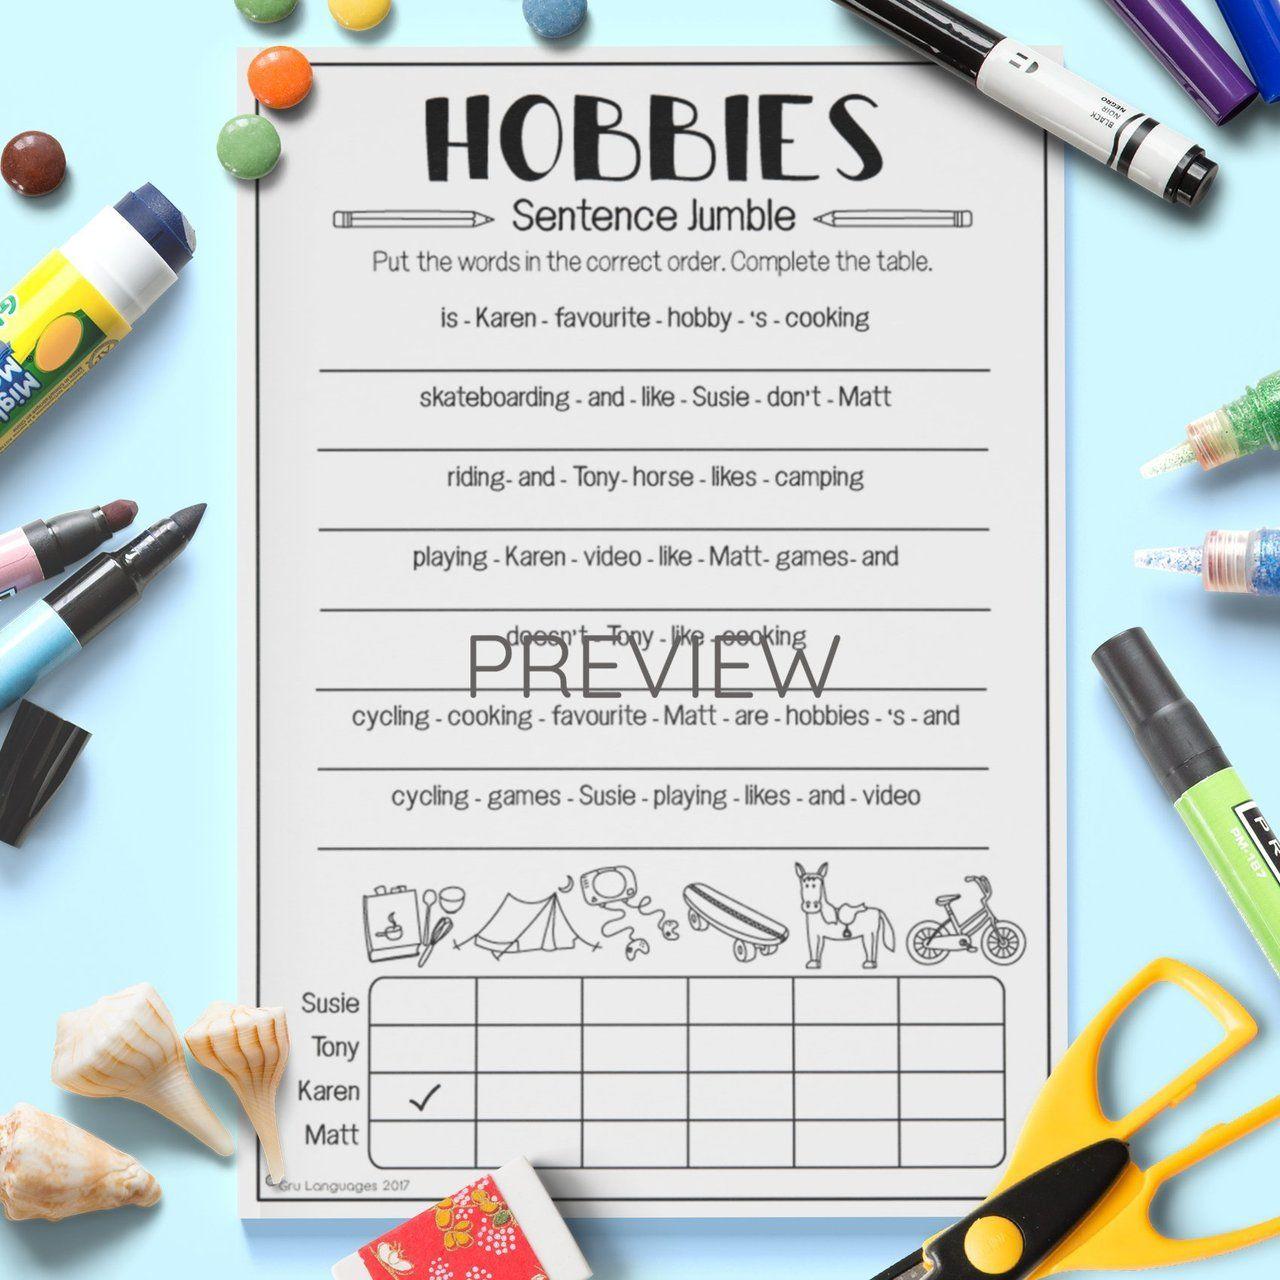 Hobbies Sentence Jumble